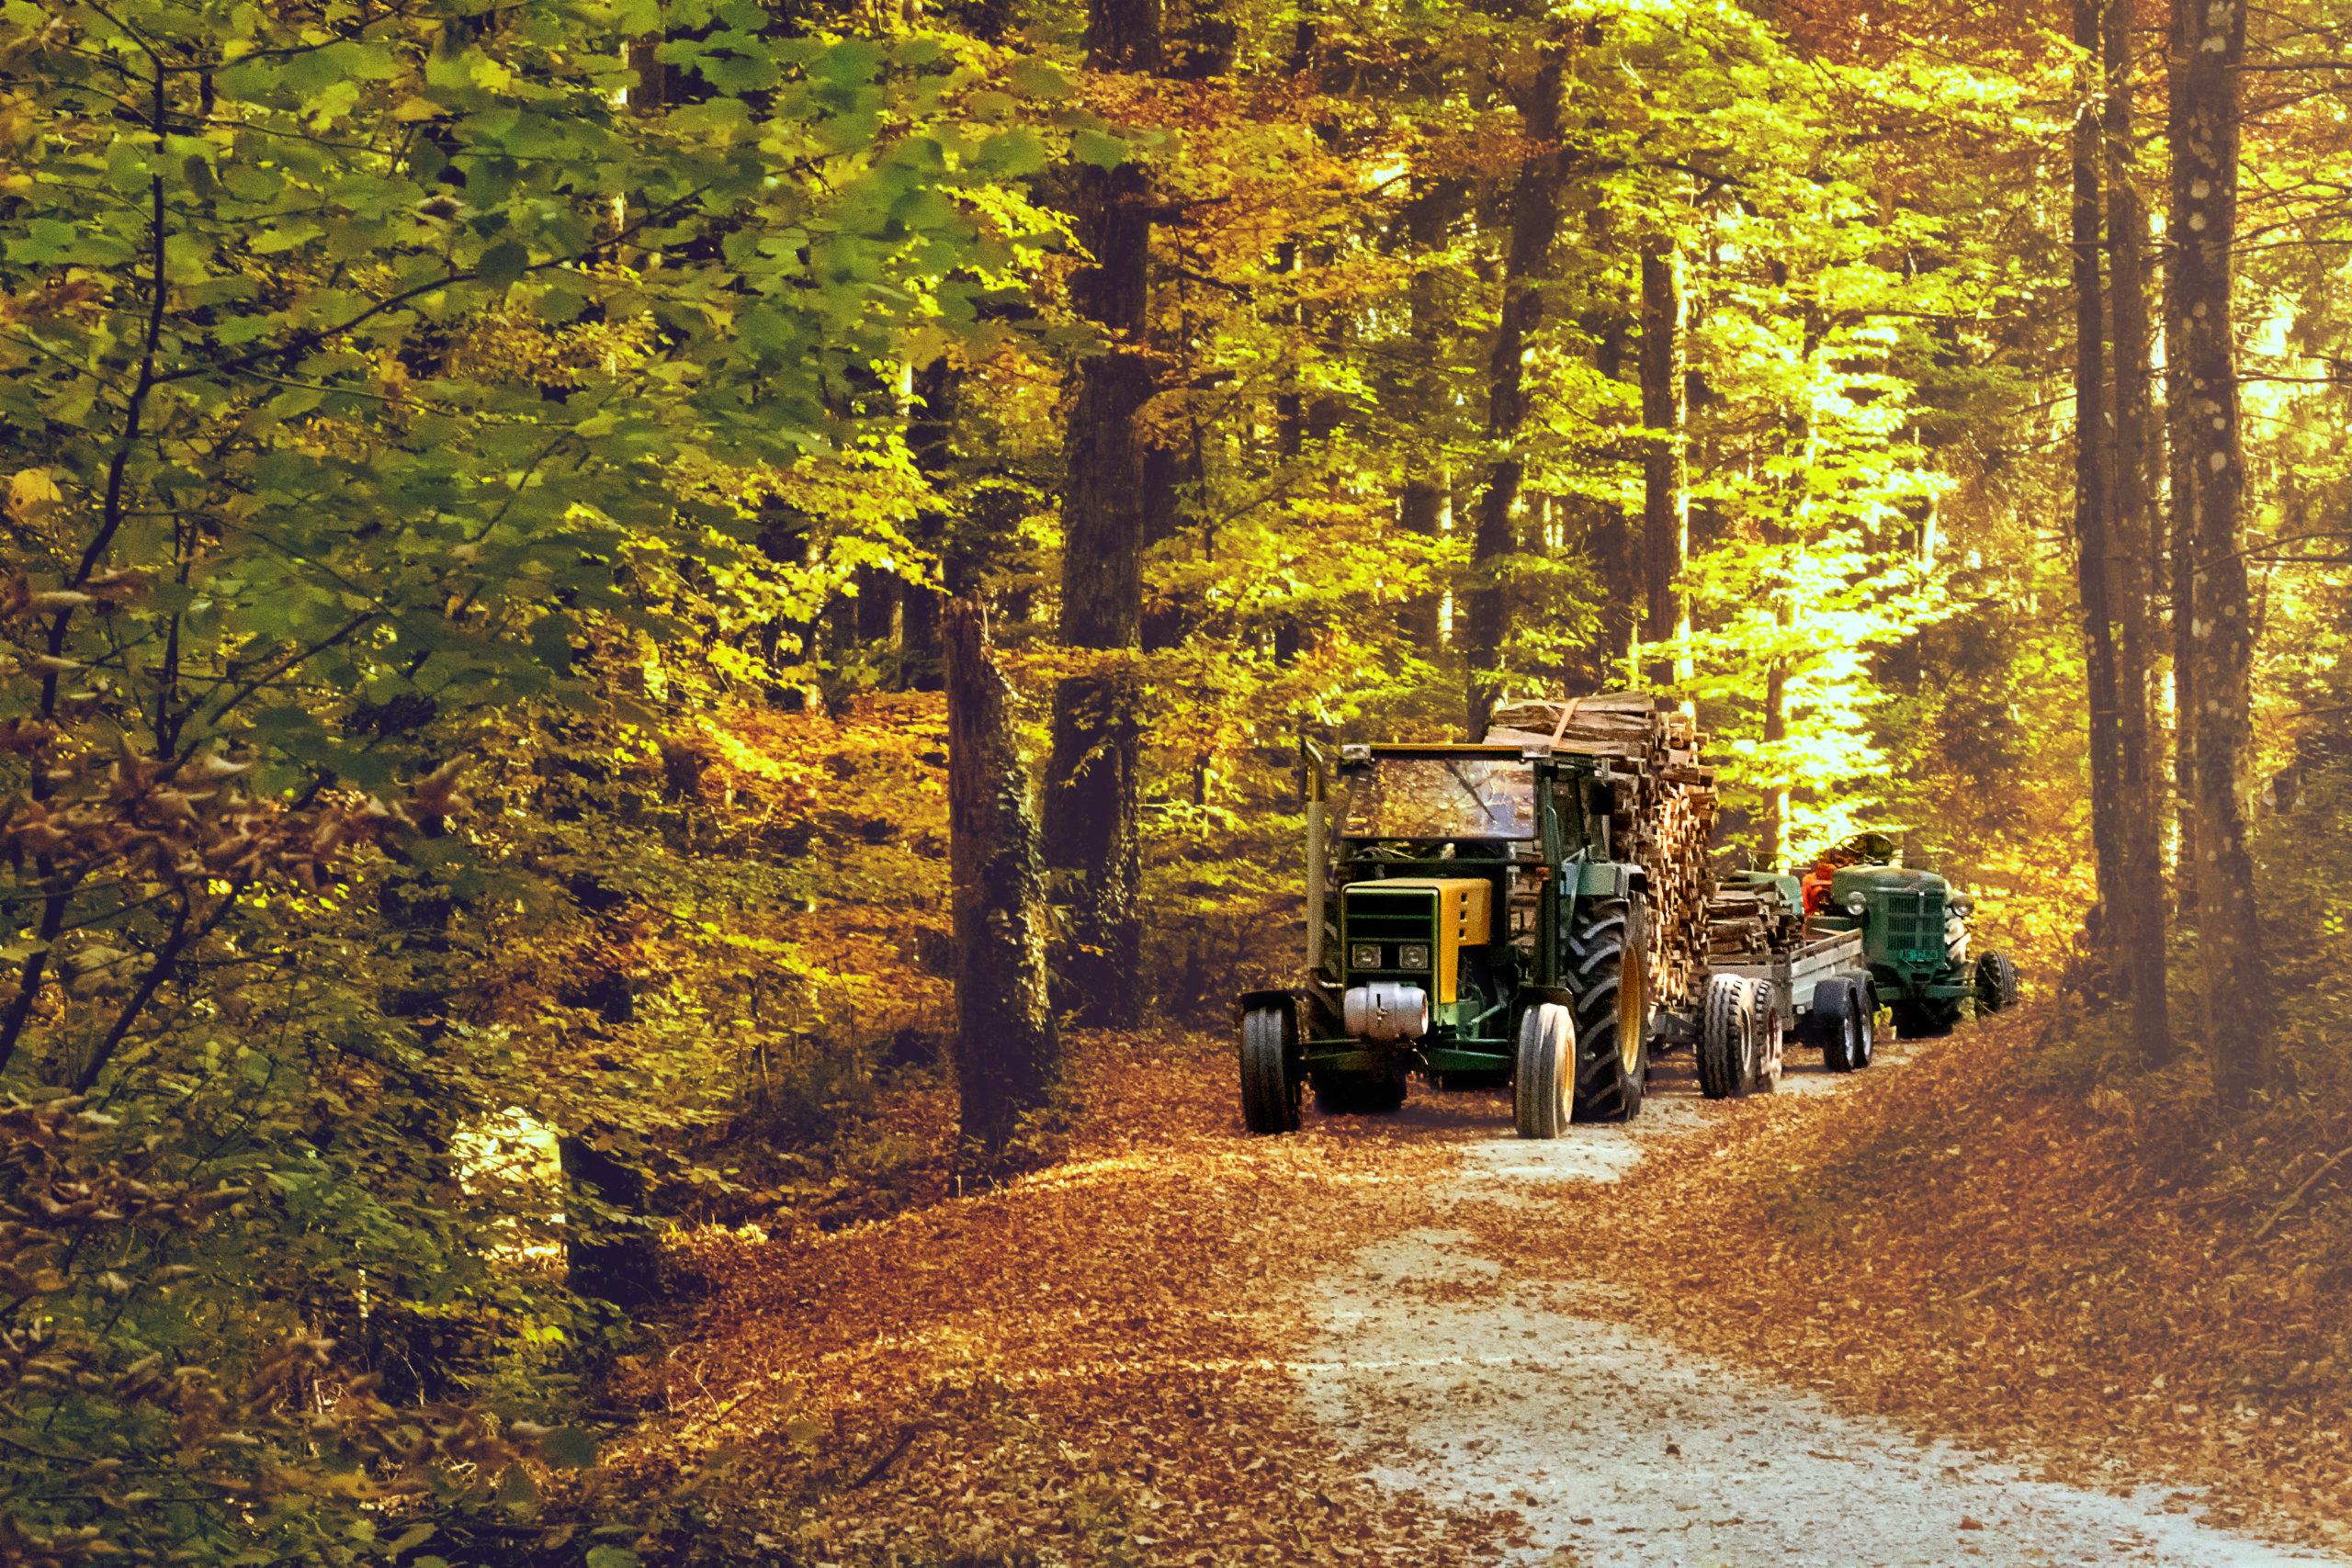 Zwitserland, bos hout hakken